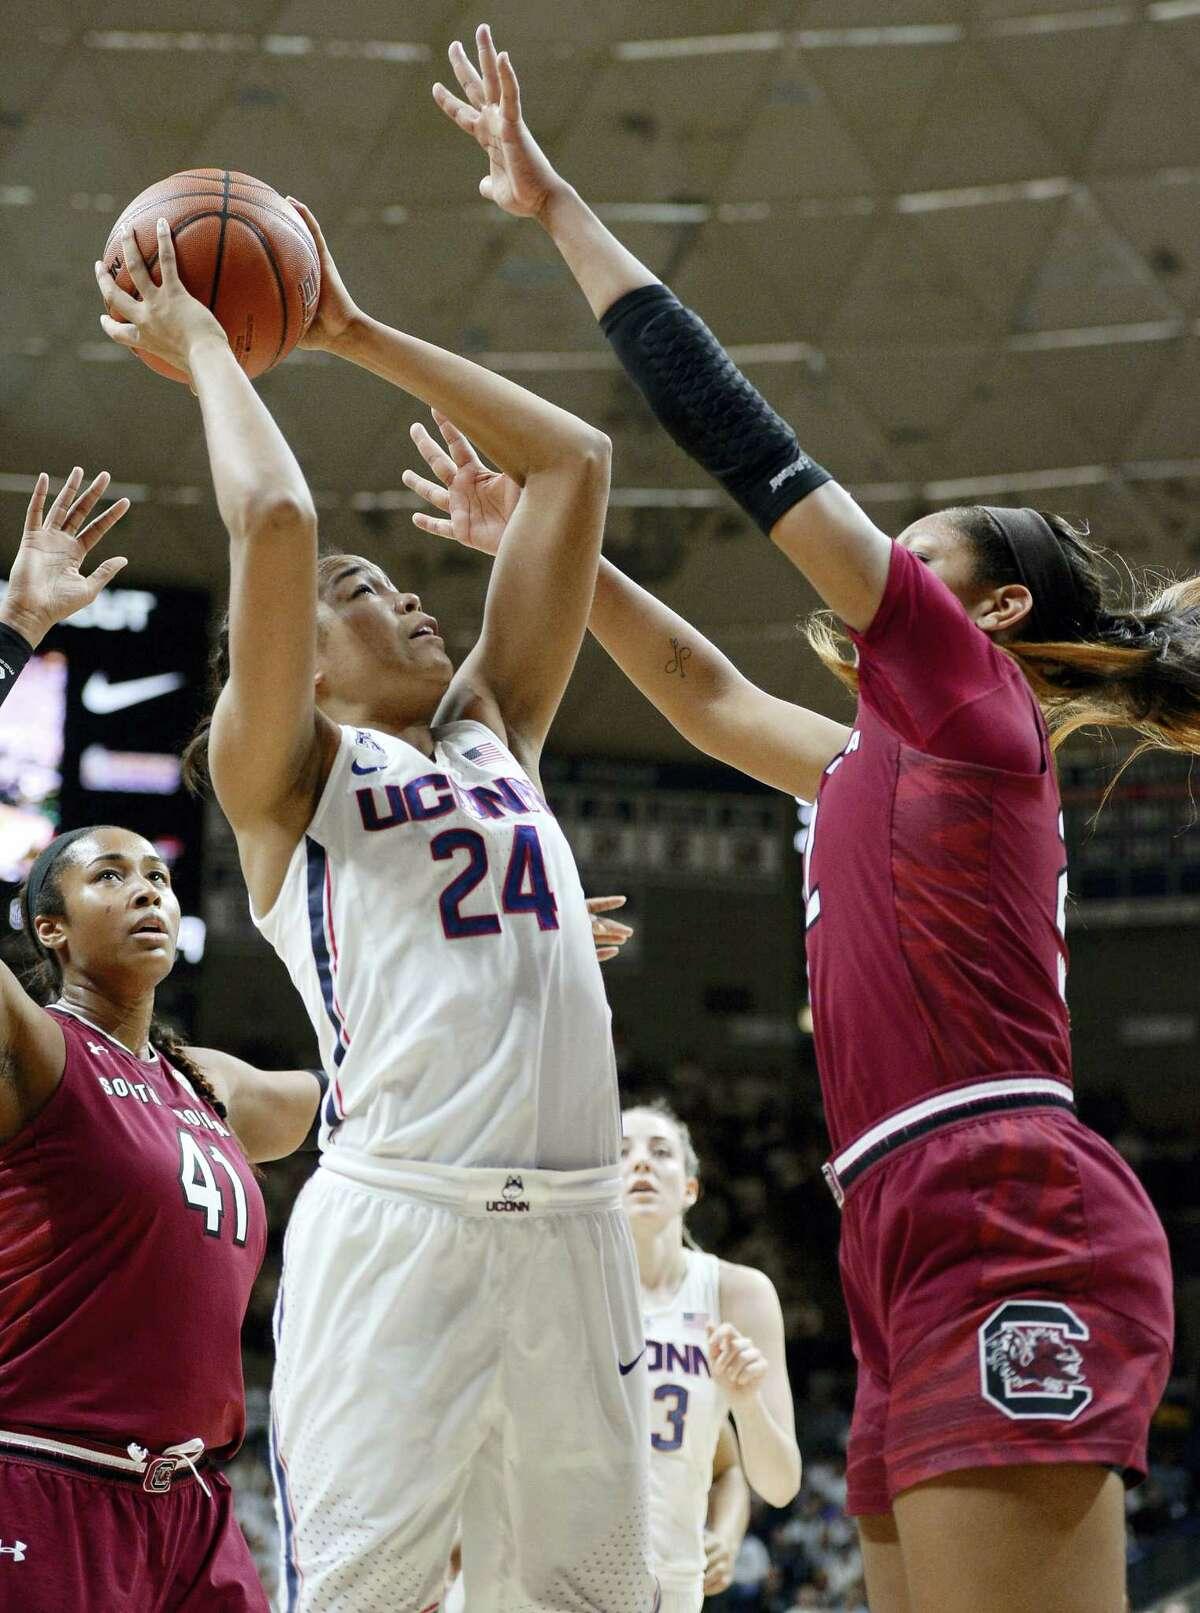 UConn's Napheesa Collier, center, shoots as South Carolina's Alaina Coates, left, and South Carolina's A'ja Wilson, right, defend on Monday.